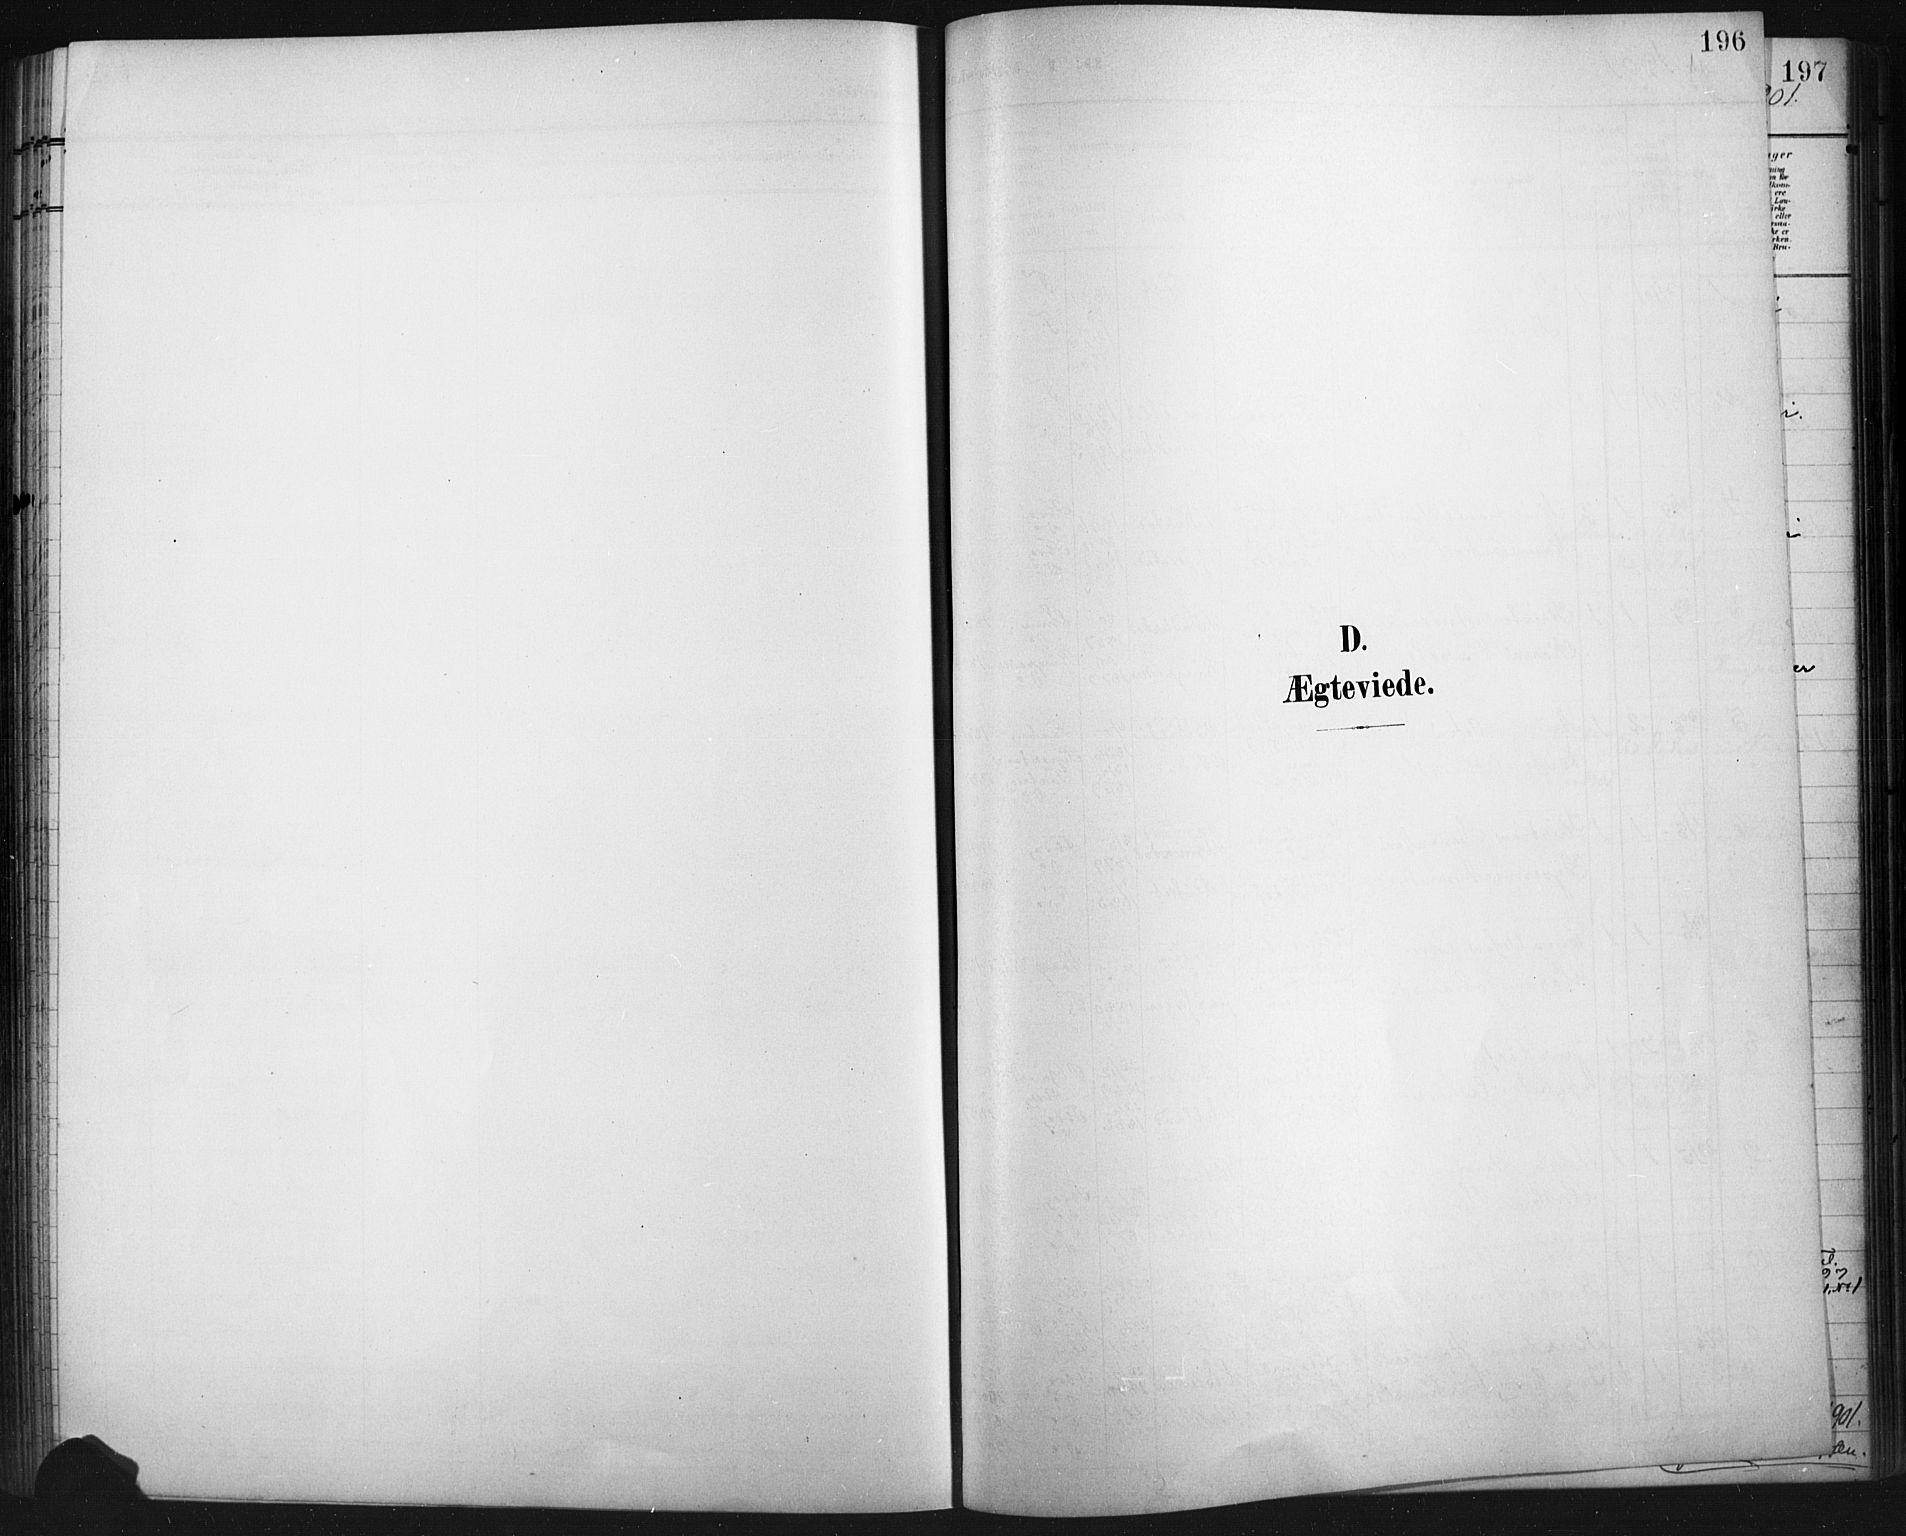 SAH, Fåberg prestekontor, Klokkerbok nr. 11, 1901-1921, s. 196